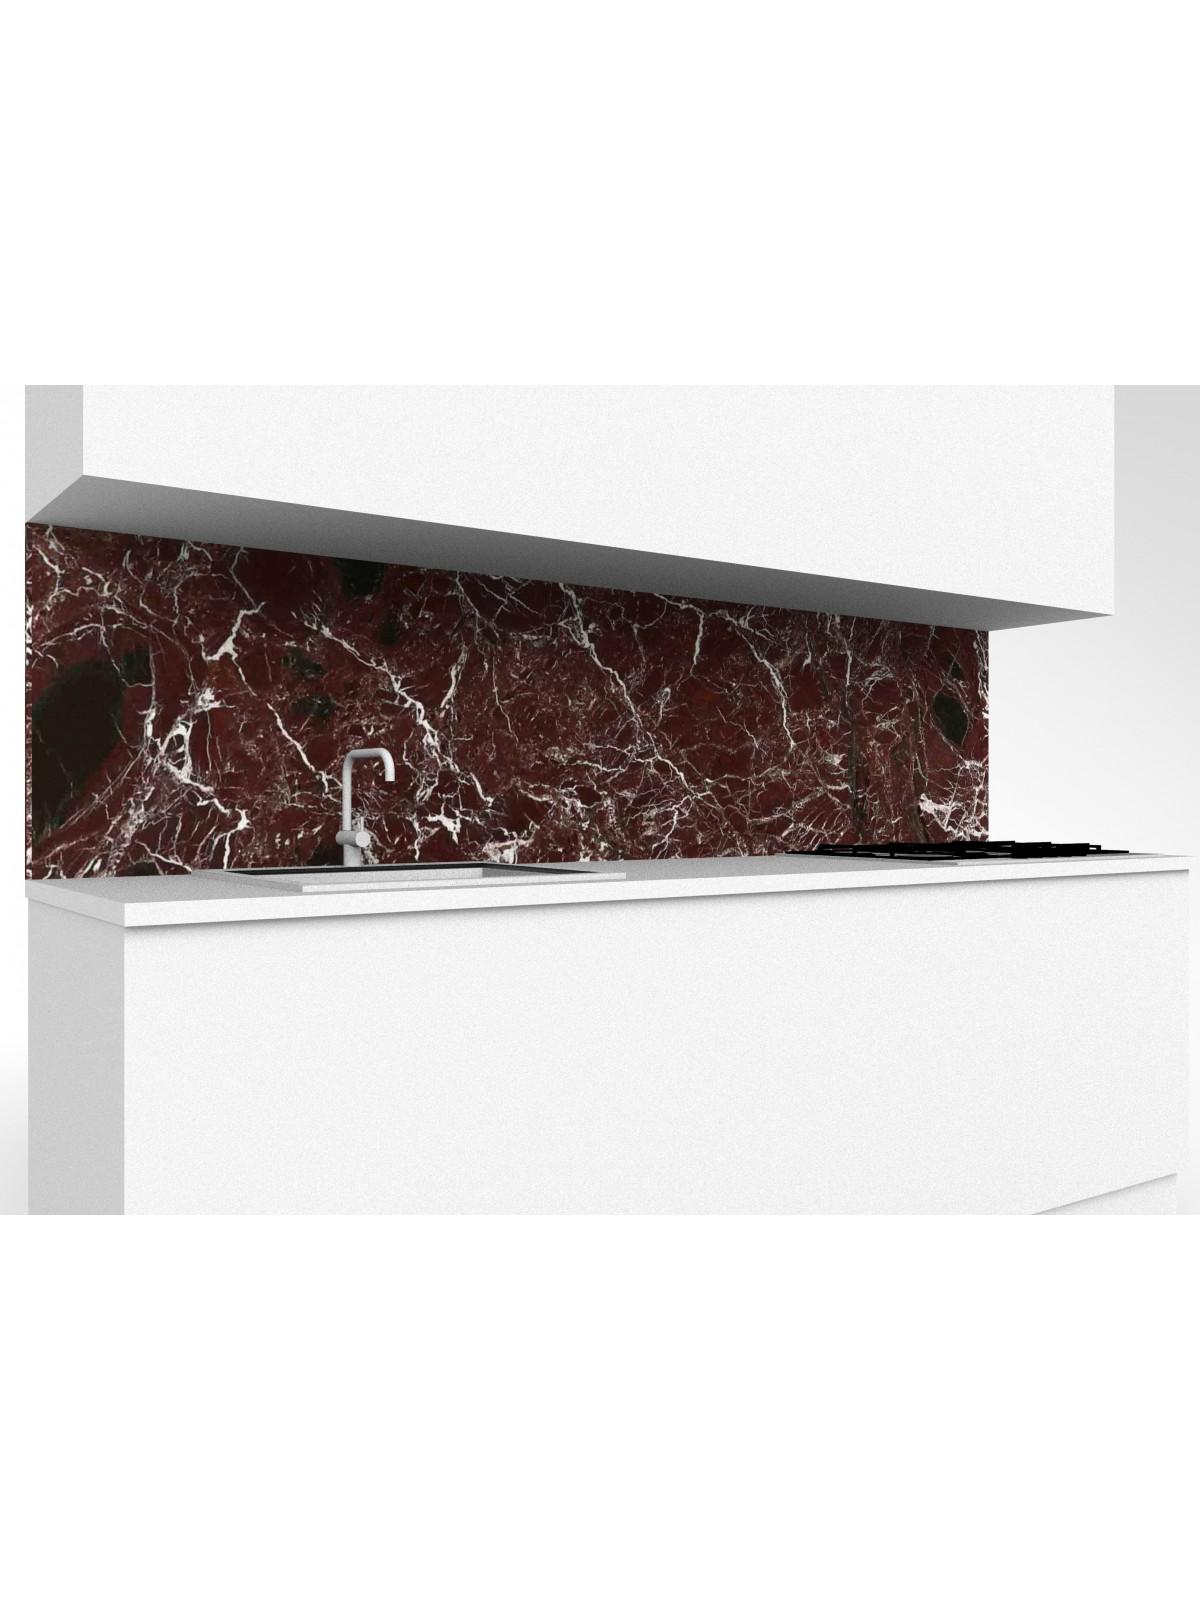 Top mobile Küche aus Rosso Levanto Marmor